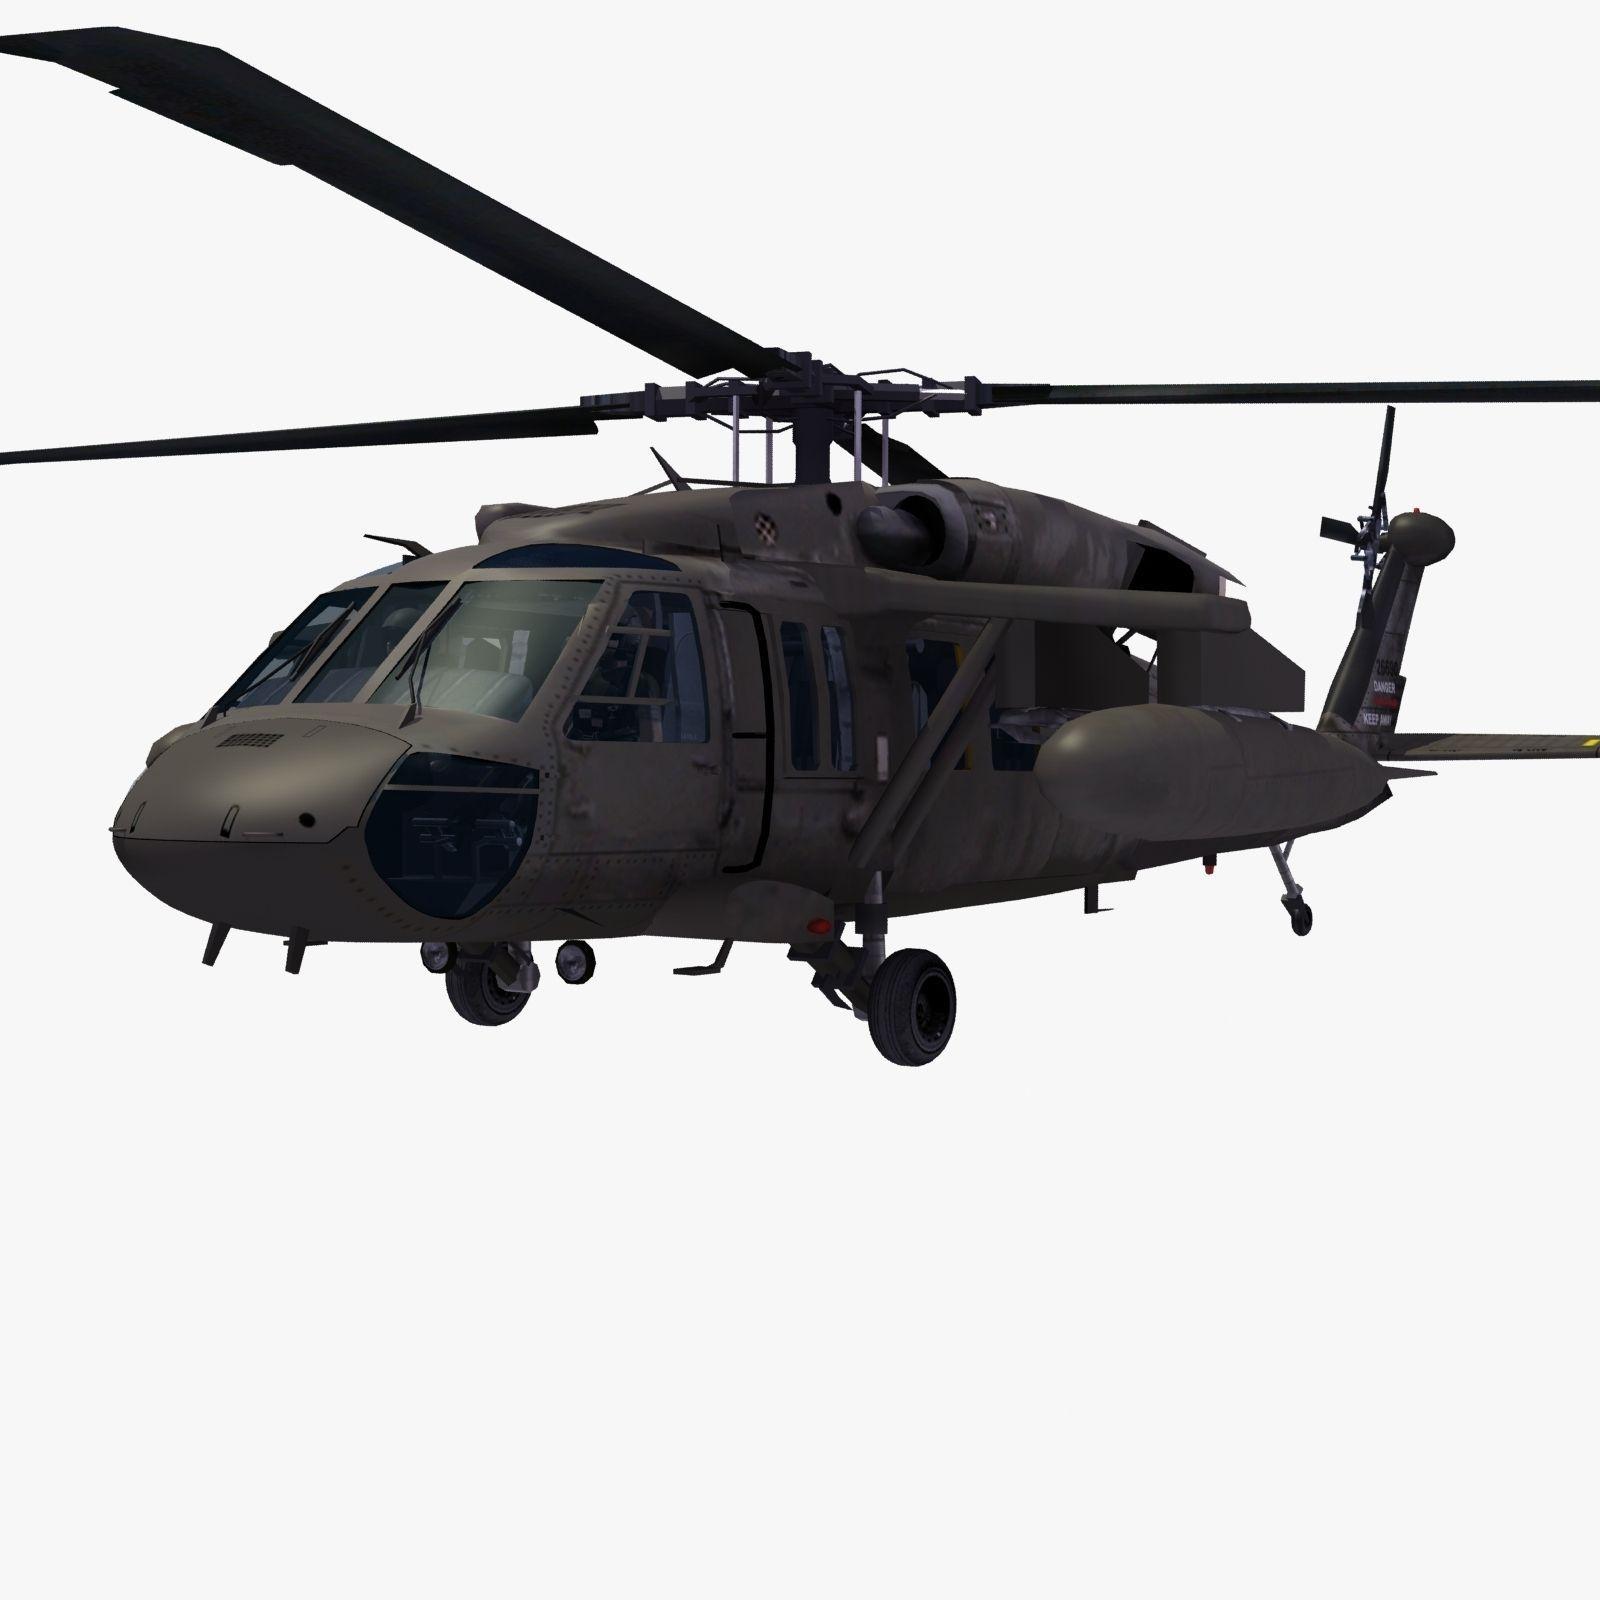 UH60 Blackhawk Helicopter 3D Model MAX OBJ 3DS FBX LWO LW